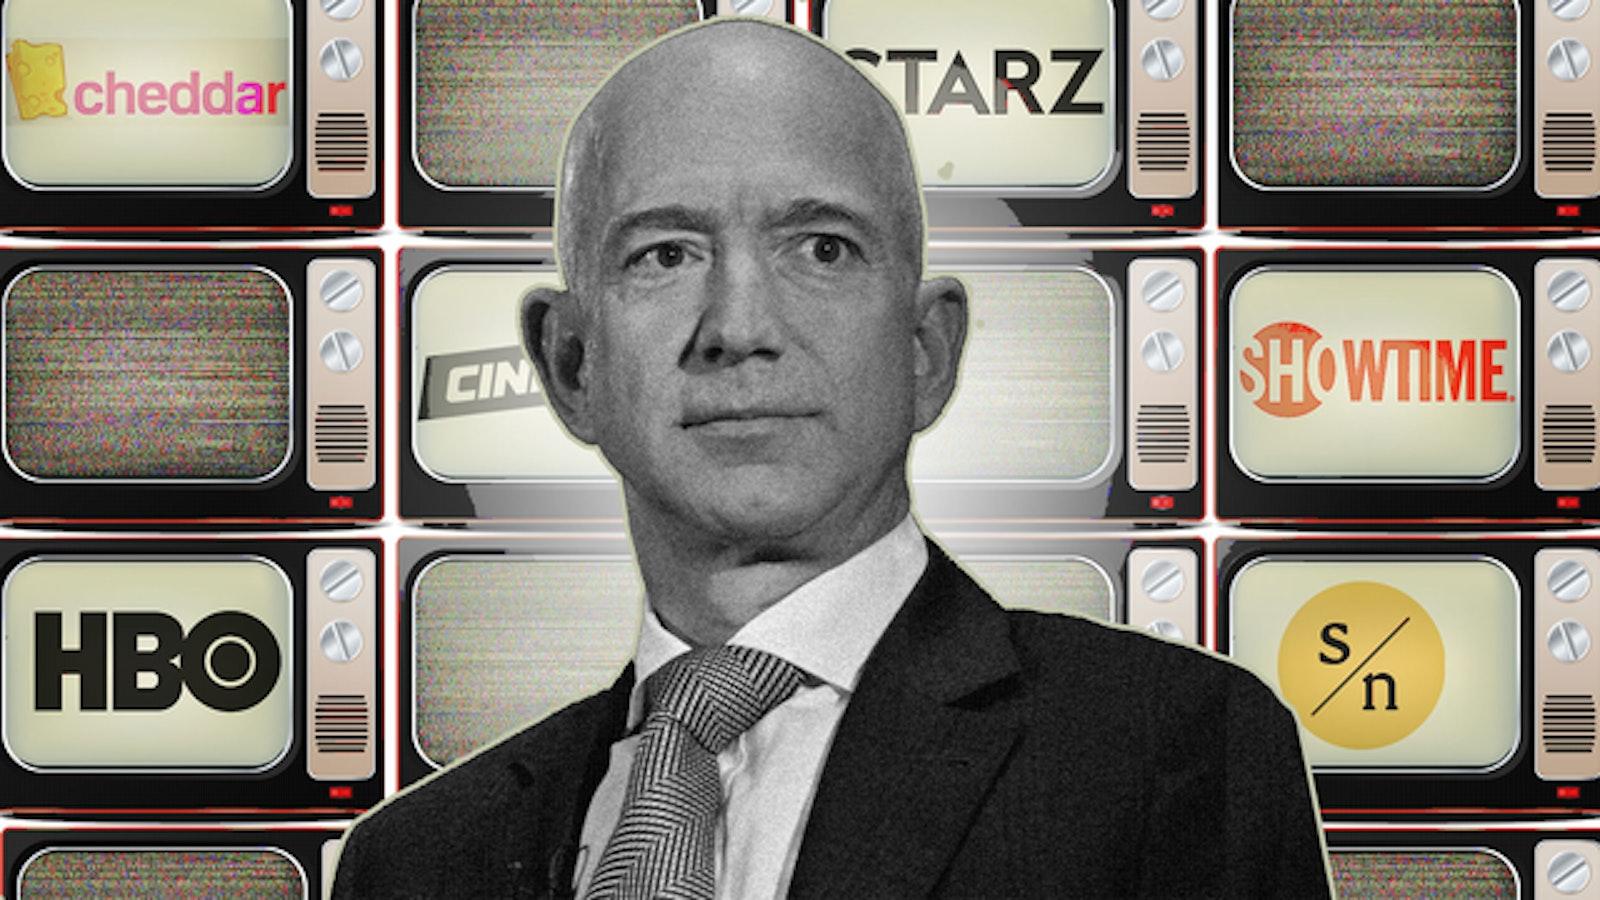 Amazon CEO Jeff Bezos. Art by Mike Sullivan